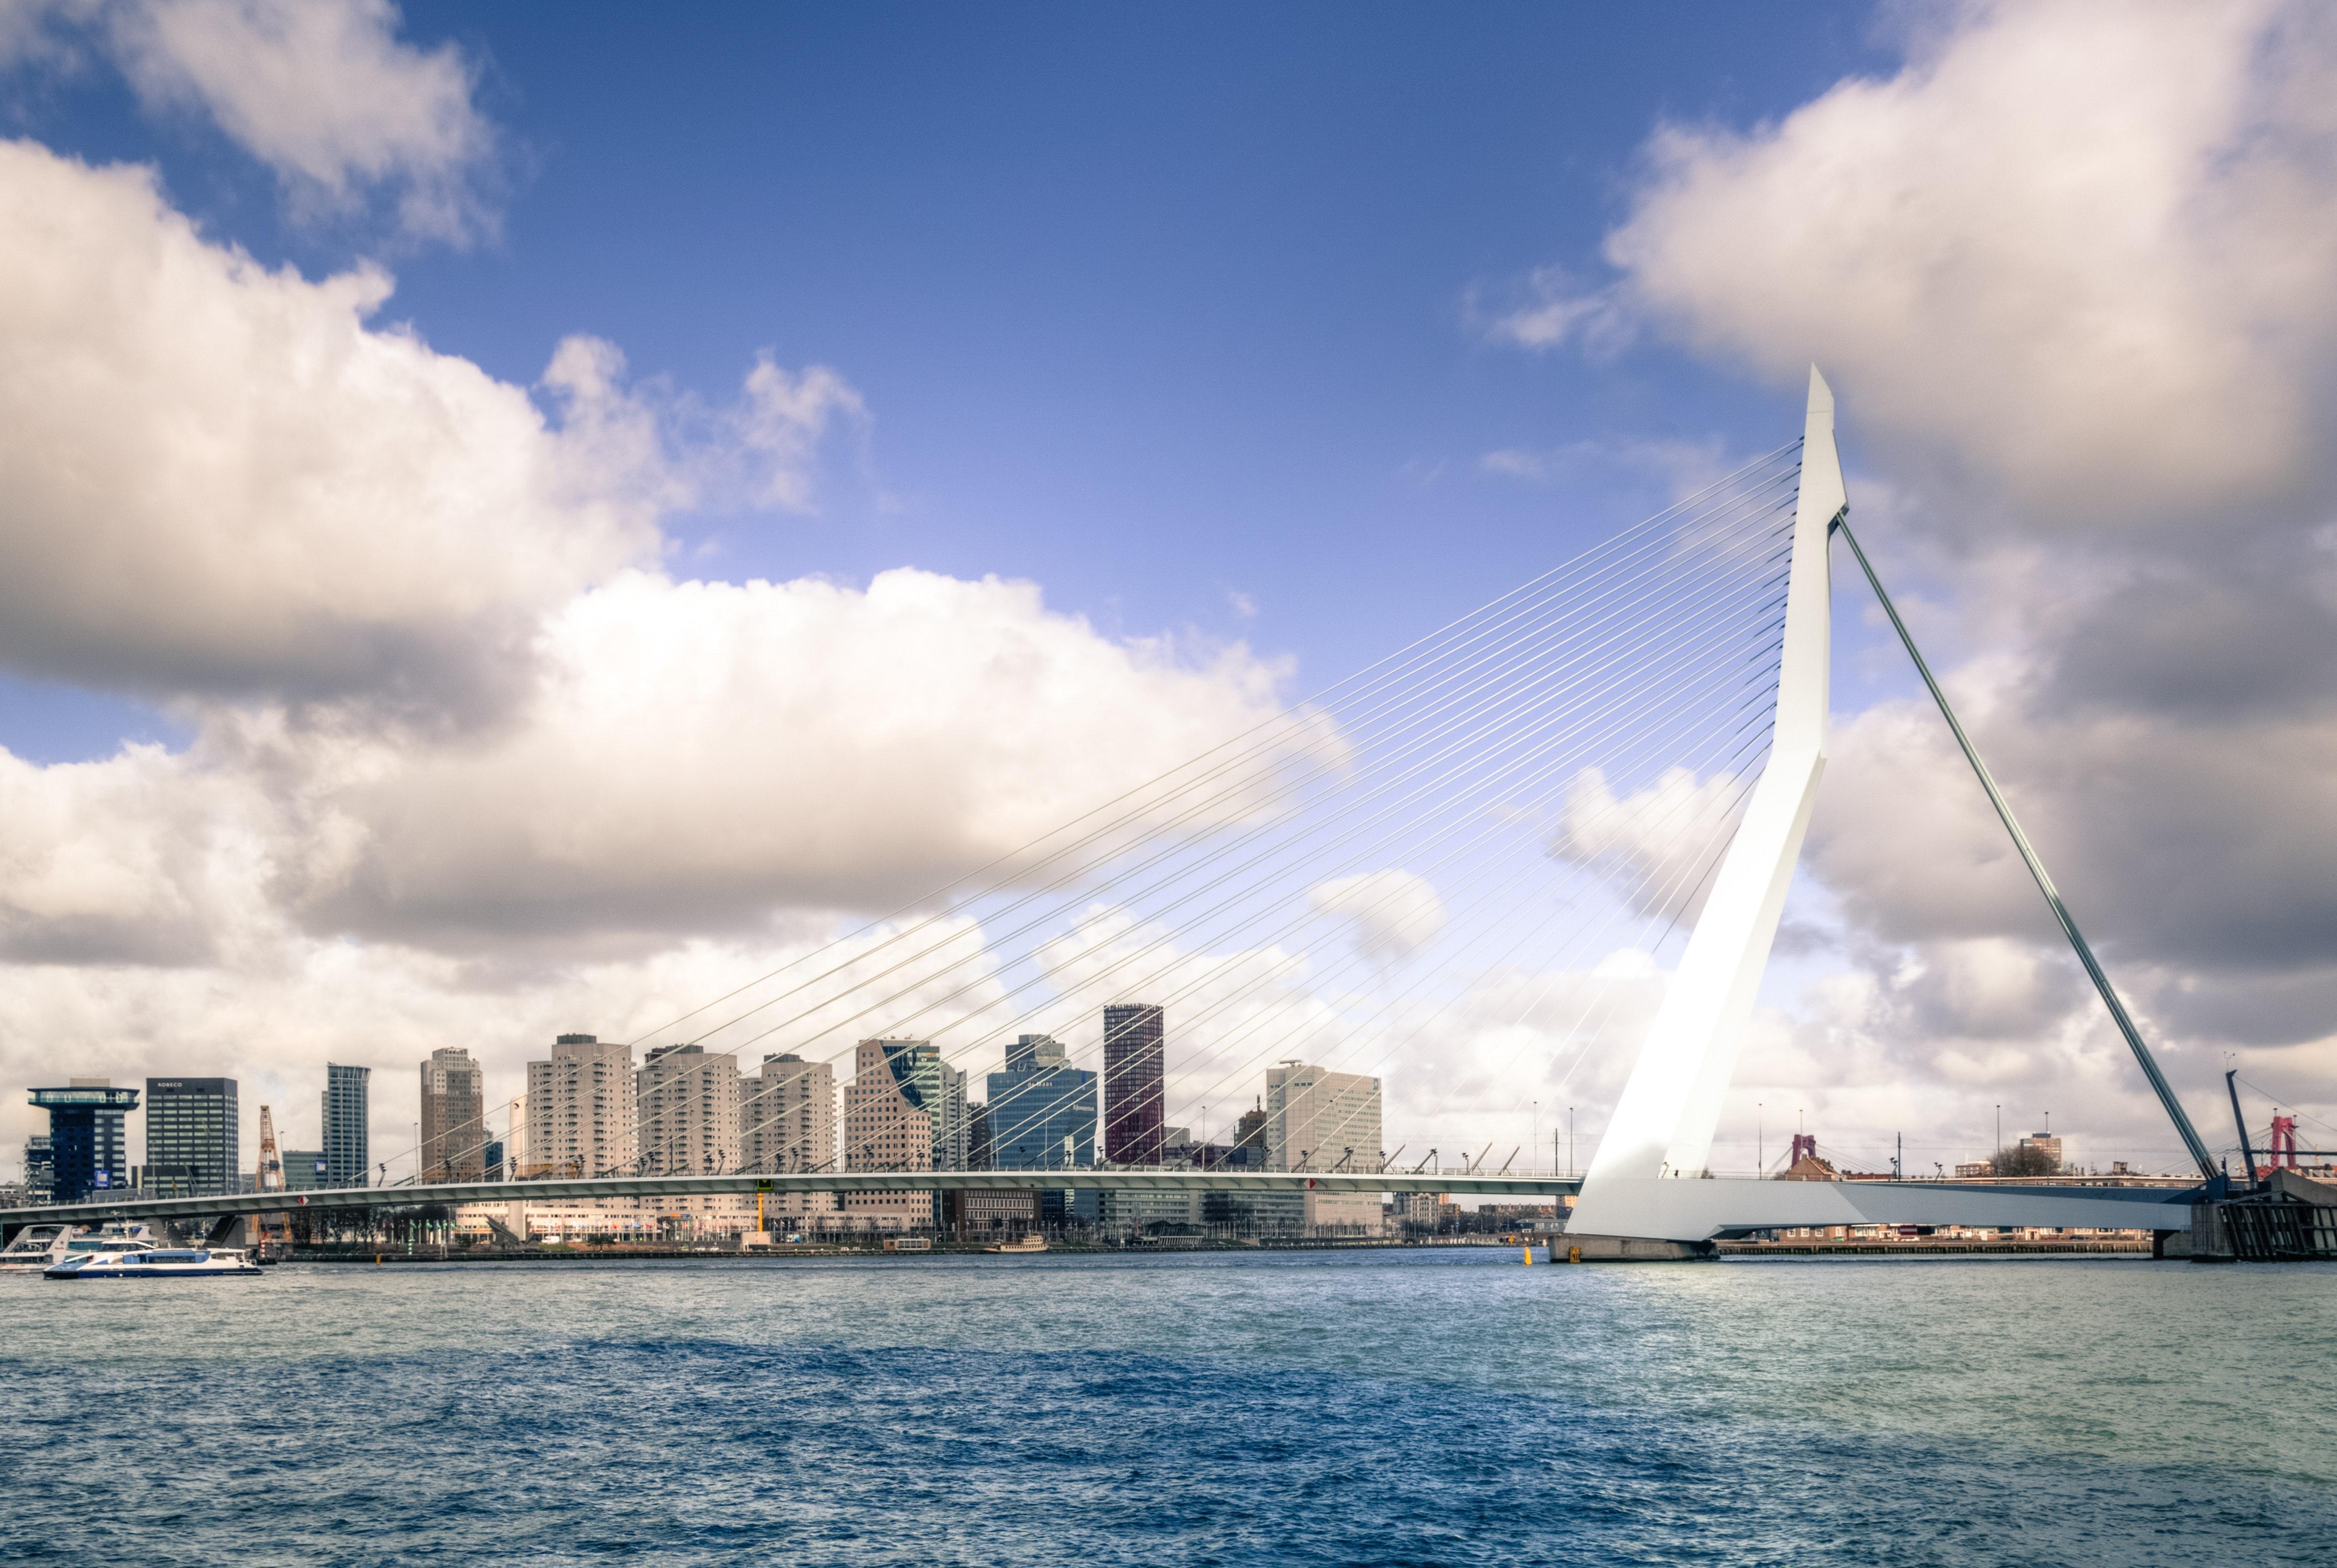 architecture-bridge-buildings-735790.jpg